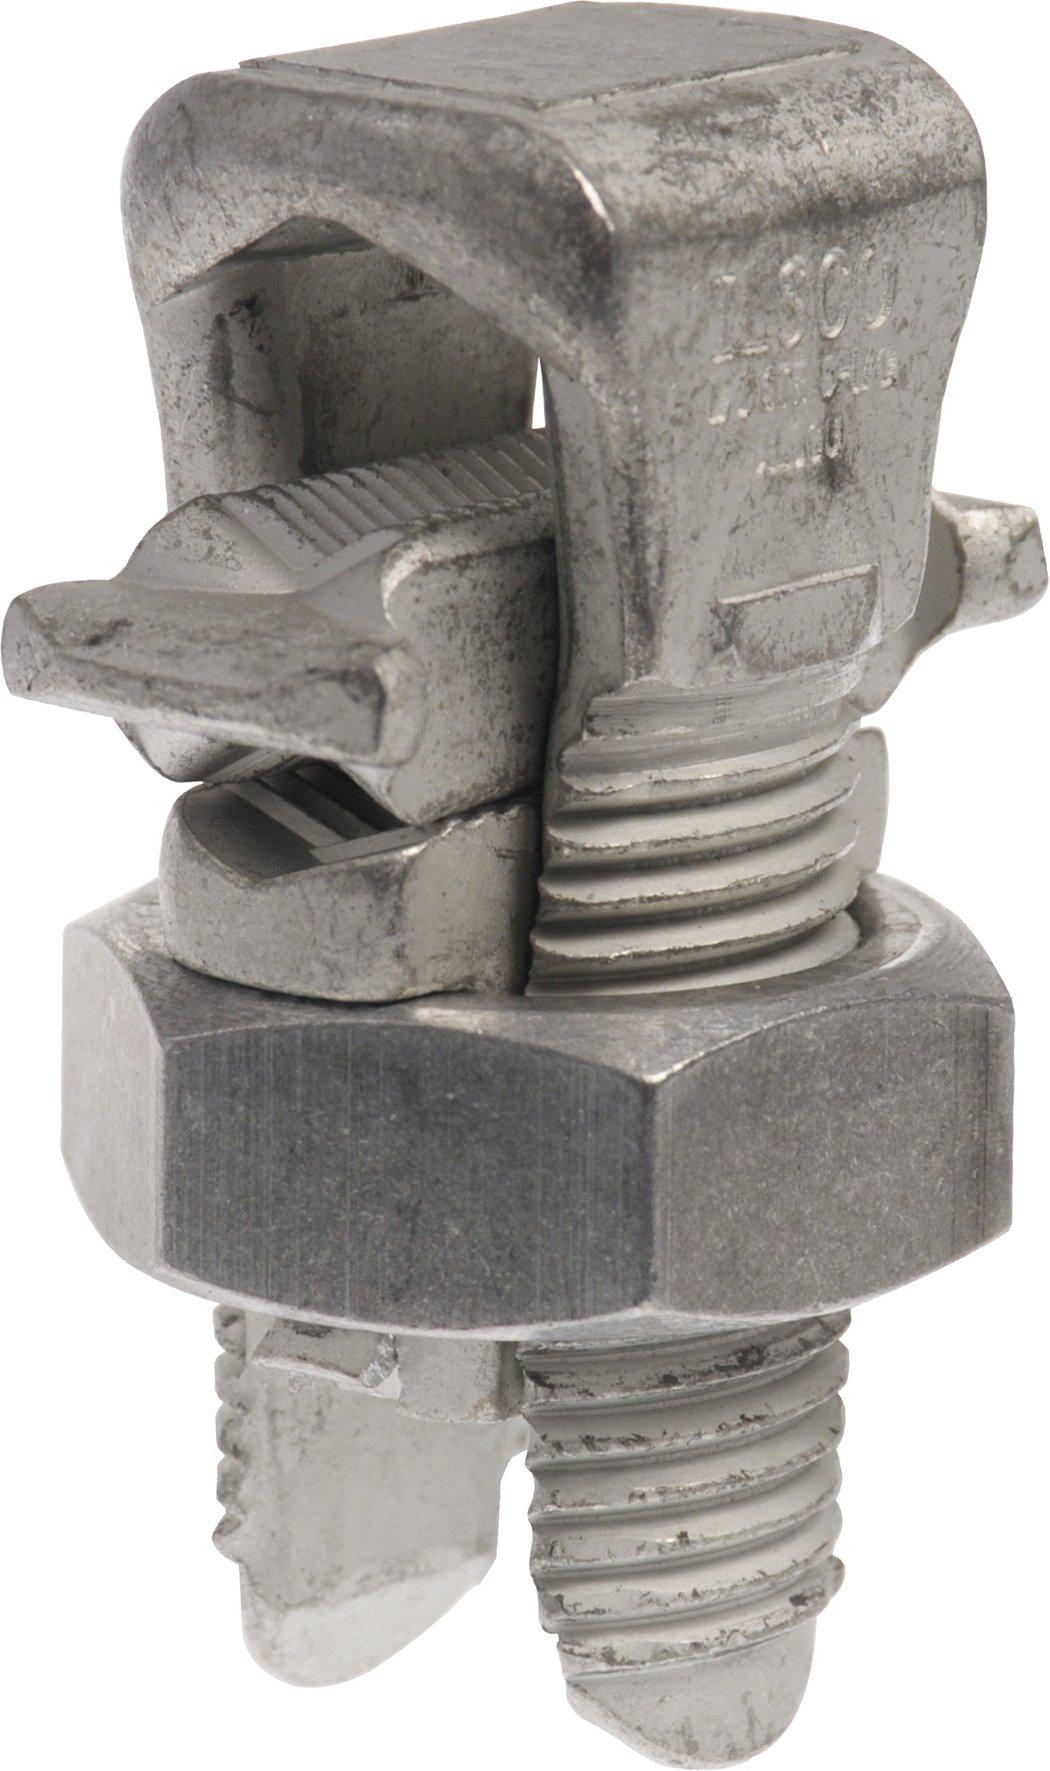 The Hillman Group 50331  Number 2 Strand Aluminum Split Bolt, 2-Pack